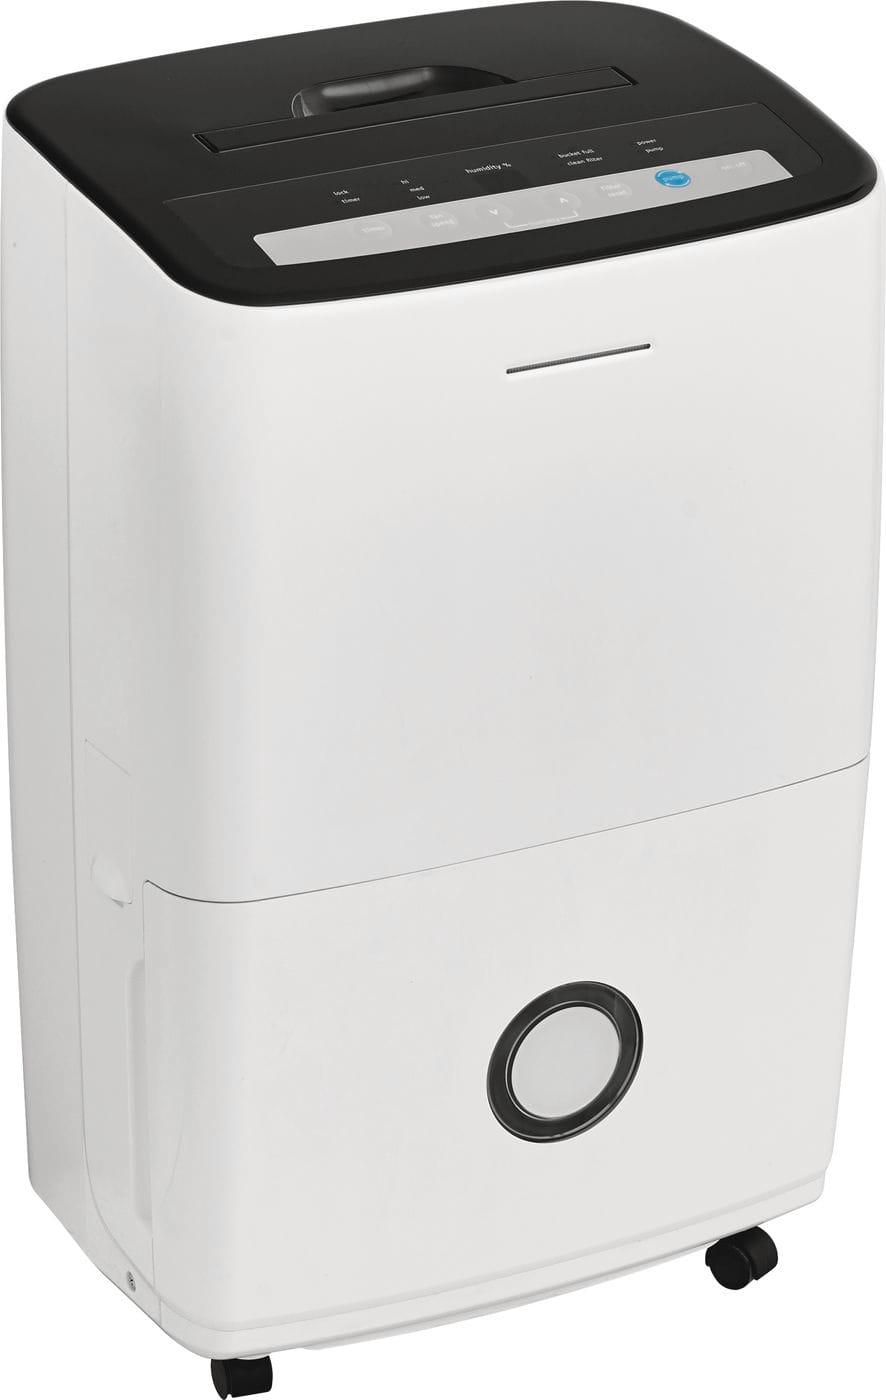 Model: FFAP7033T1 | Frigidaire Large Room 70 Pint Capacity Dehumidifier with Pump